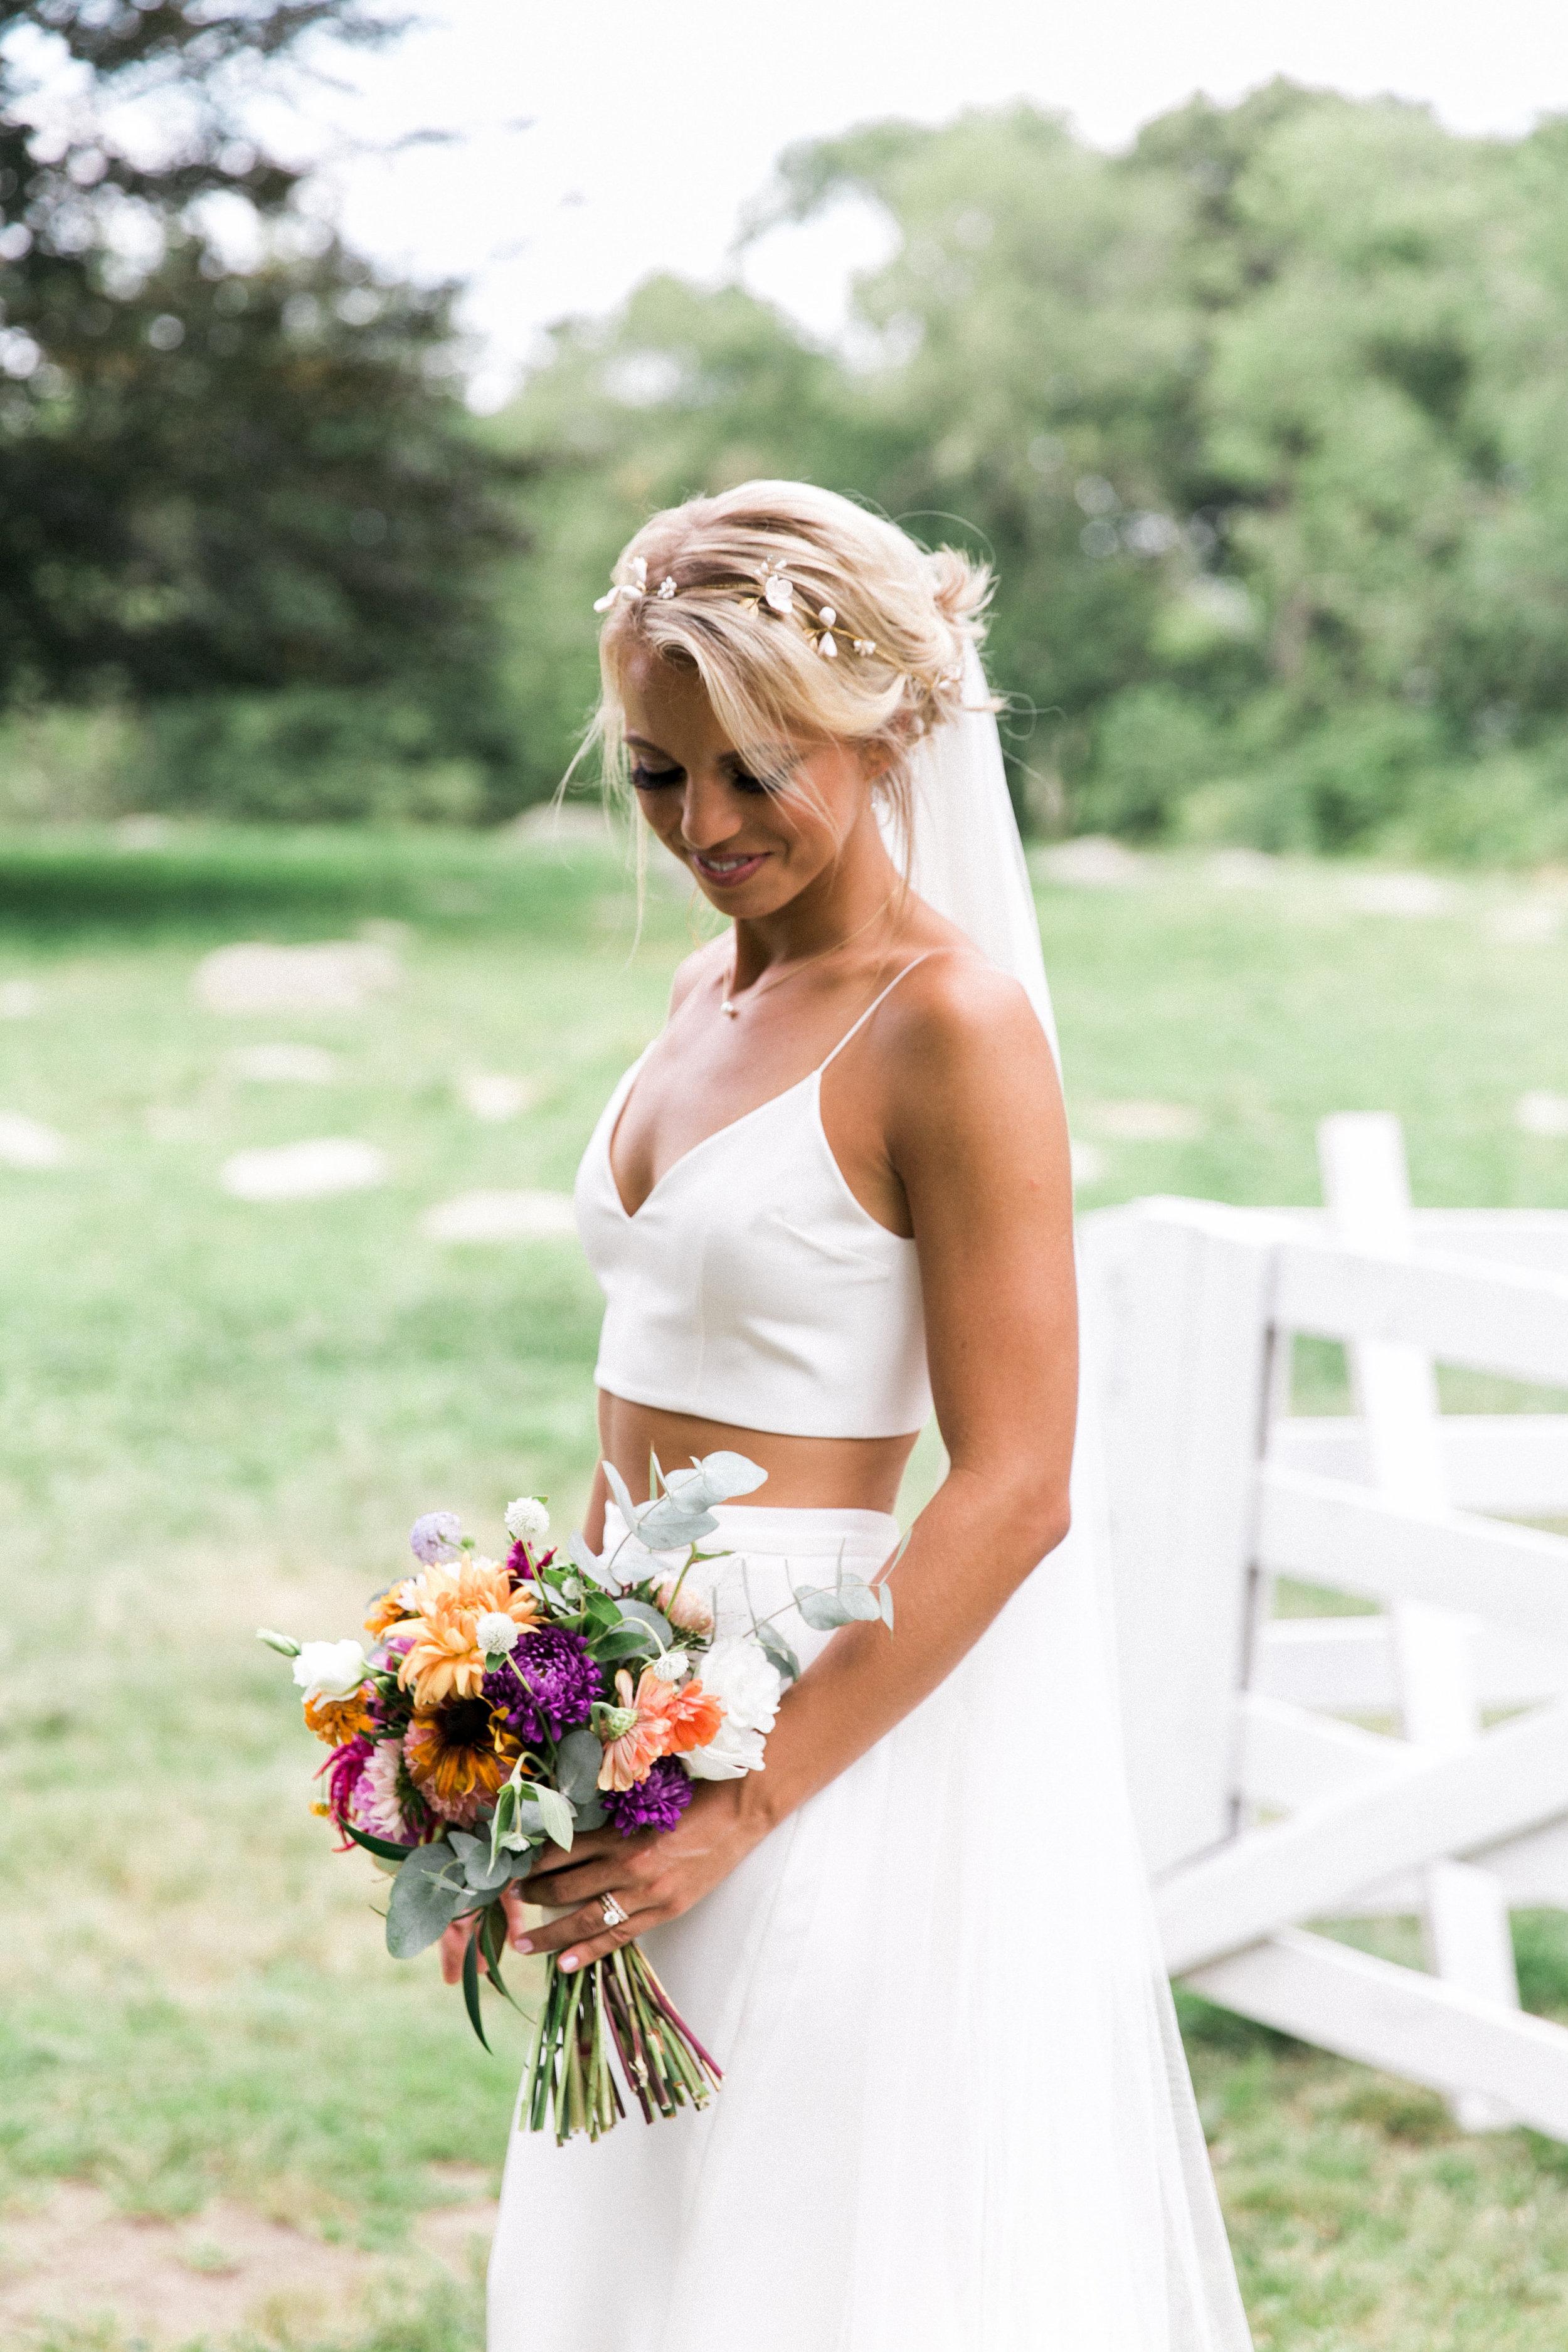 Barberry-Hill-Farm-Wedding-Madison-CT-Emily-and-Dan-August-2018-Connecticut-Wedd-0008.jpg